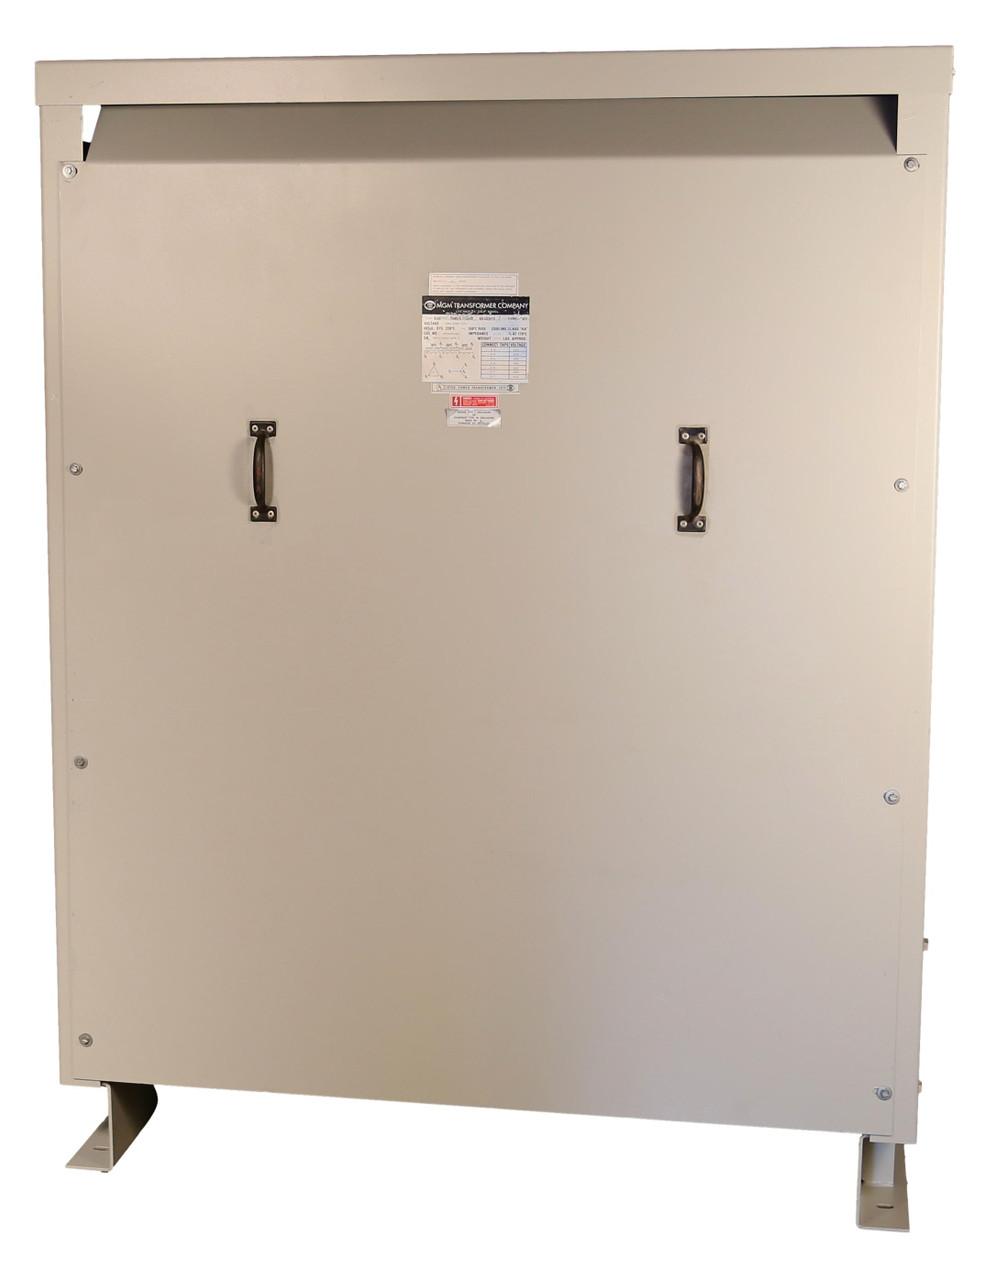 HT500A3B2 500 kVA XFMR